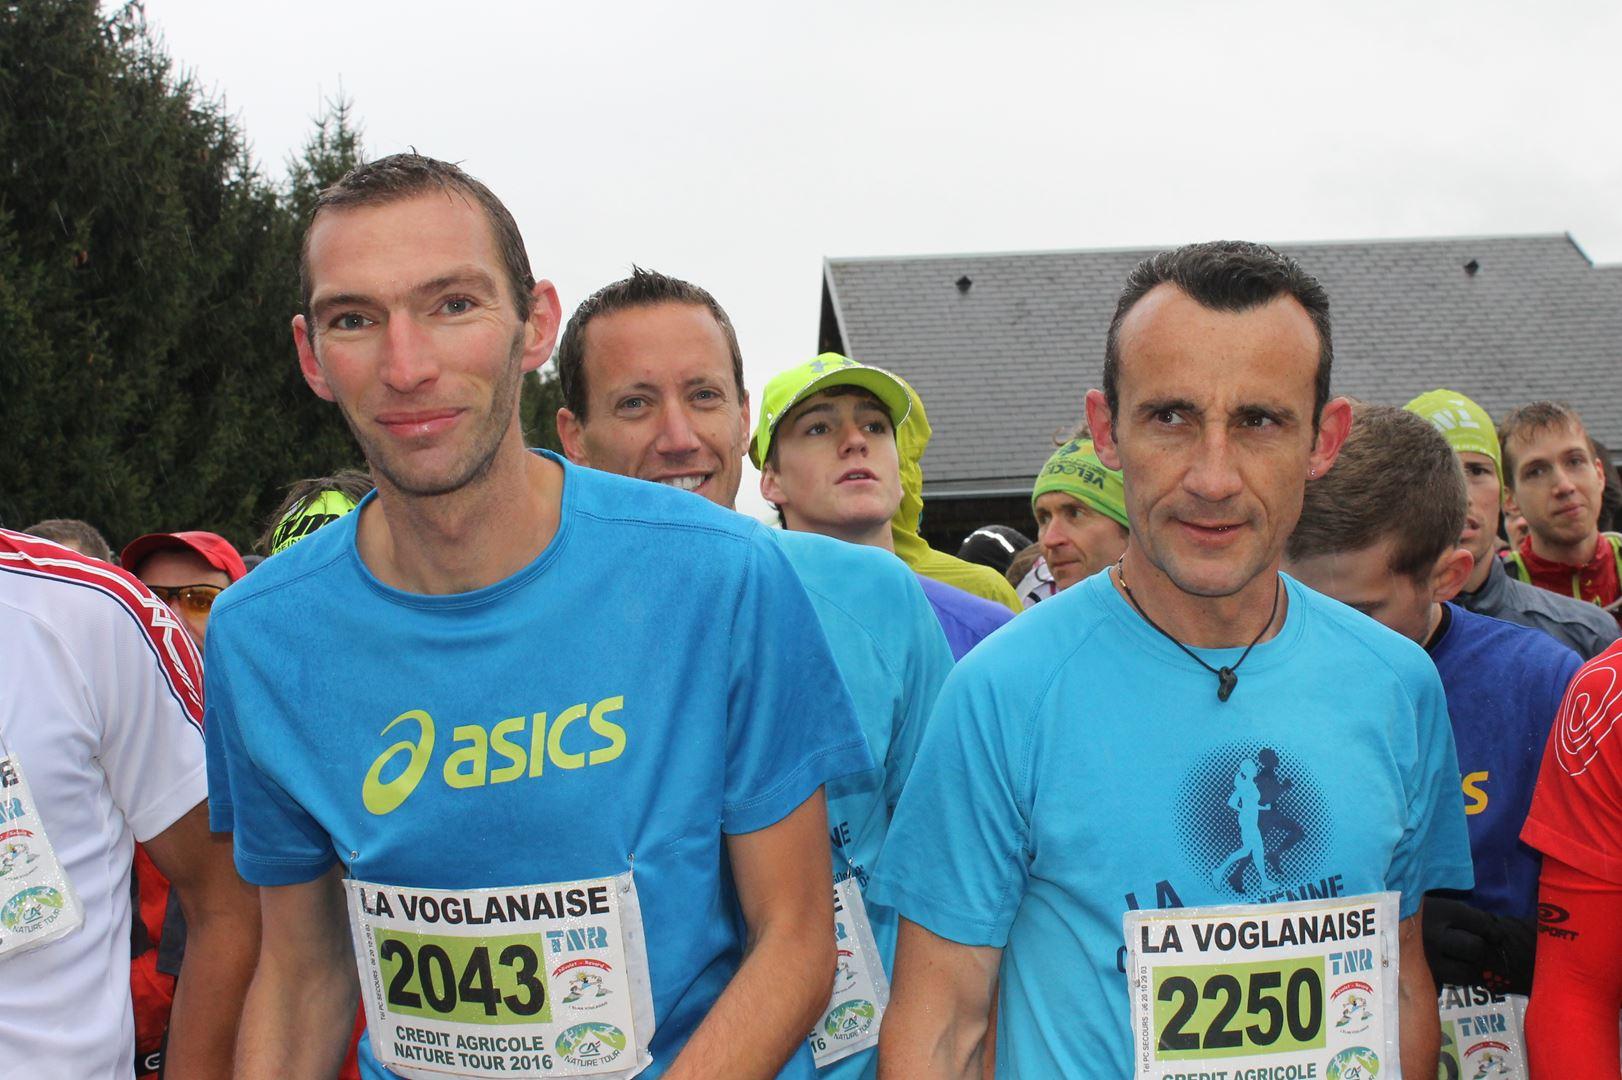 Sébastien Masbous et Nicolas Inaudi - RESULTATS, COMPTE RENDU, PHOTOS ET VIDEOS DU TRAIL NIVOLET REVARD / 01-05-16